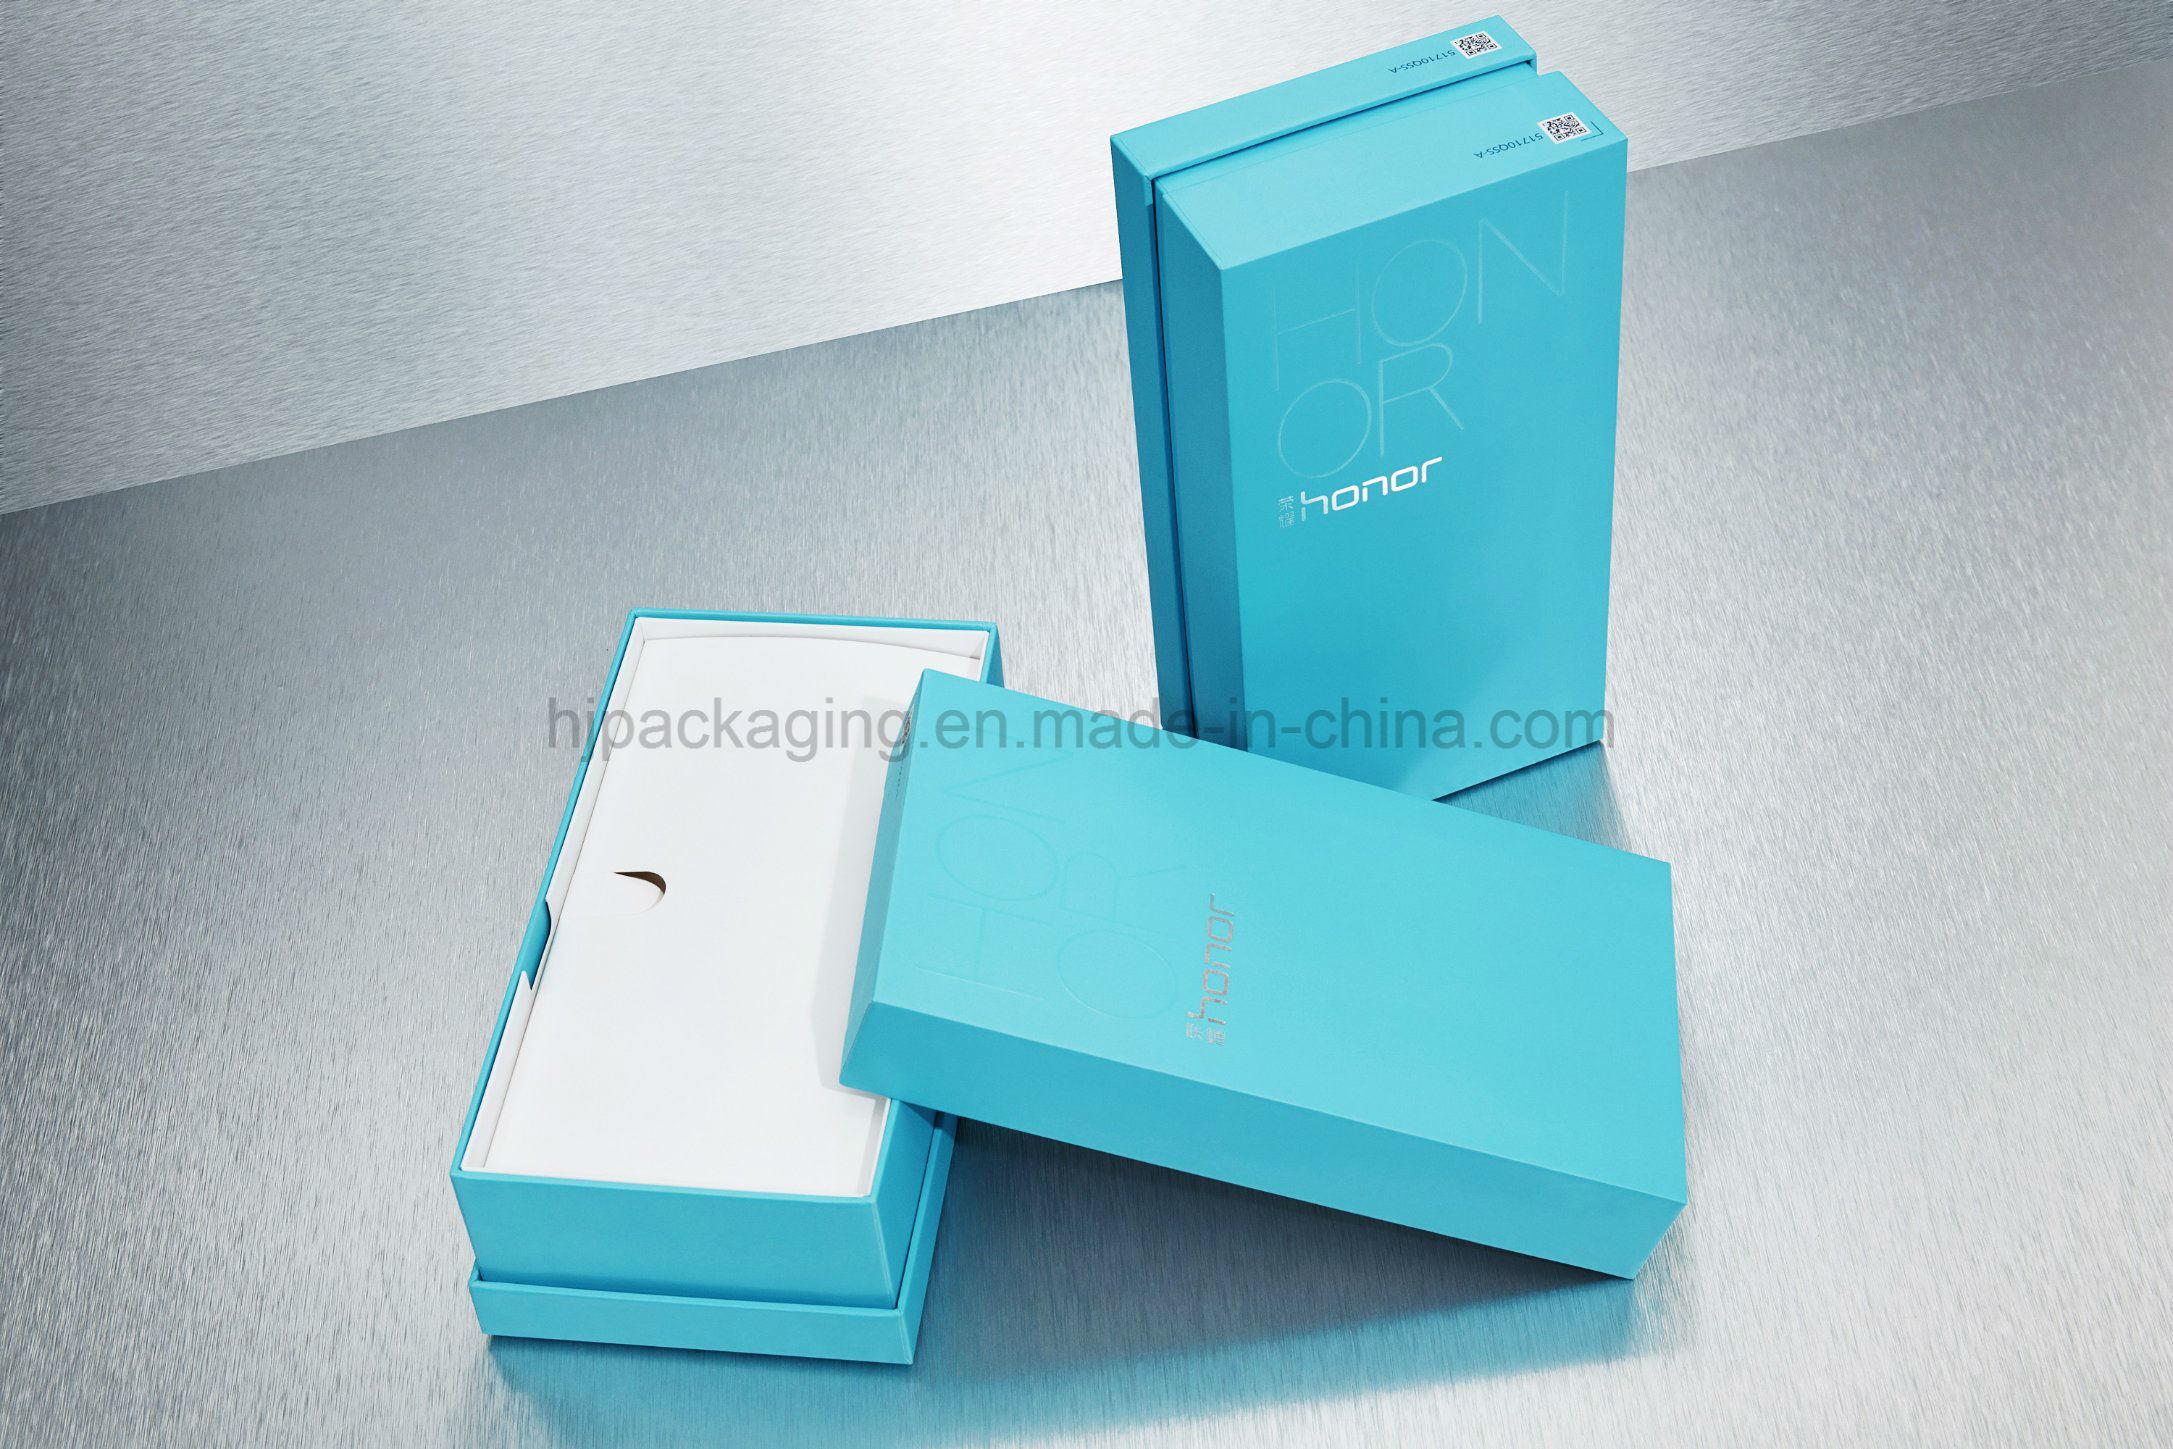 [Hot Item] Mobile Phone Box Custom Matte Lamination Cell Phone Gift Box